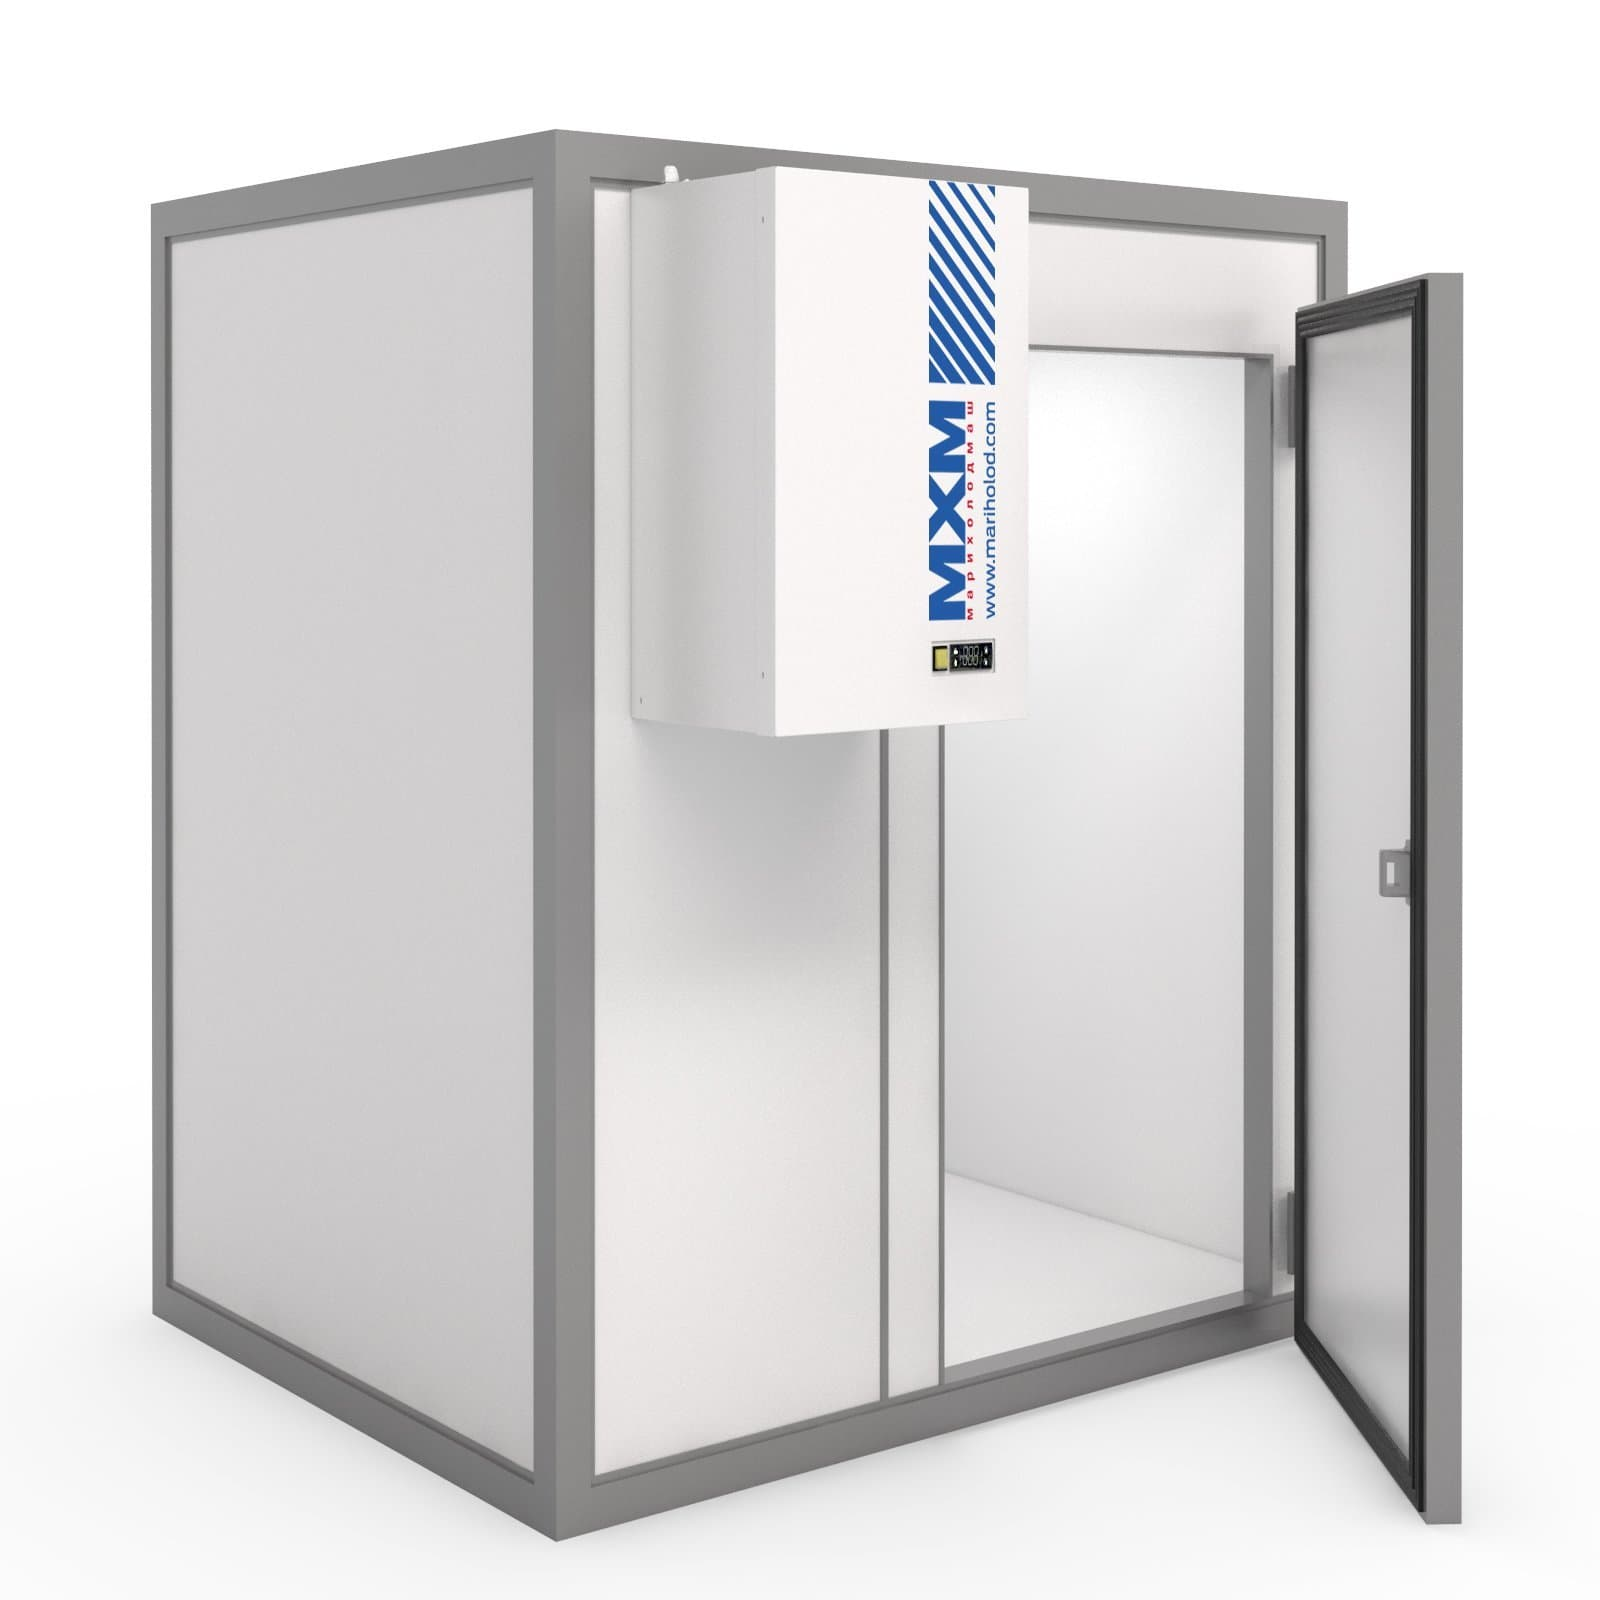 Камера холодильная МХМ КХН-40,55 1360×13360×2720